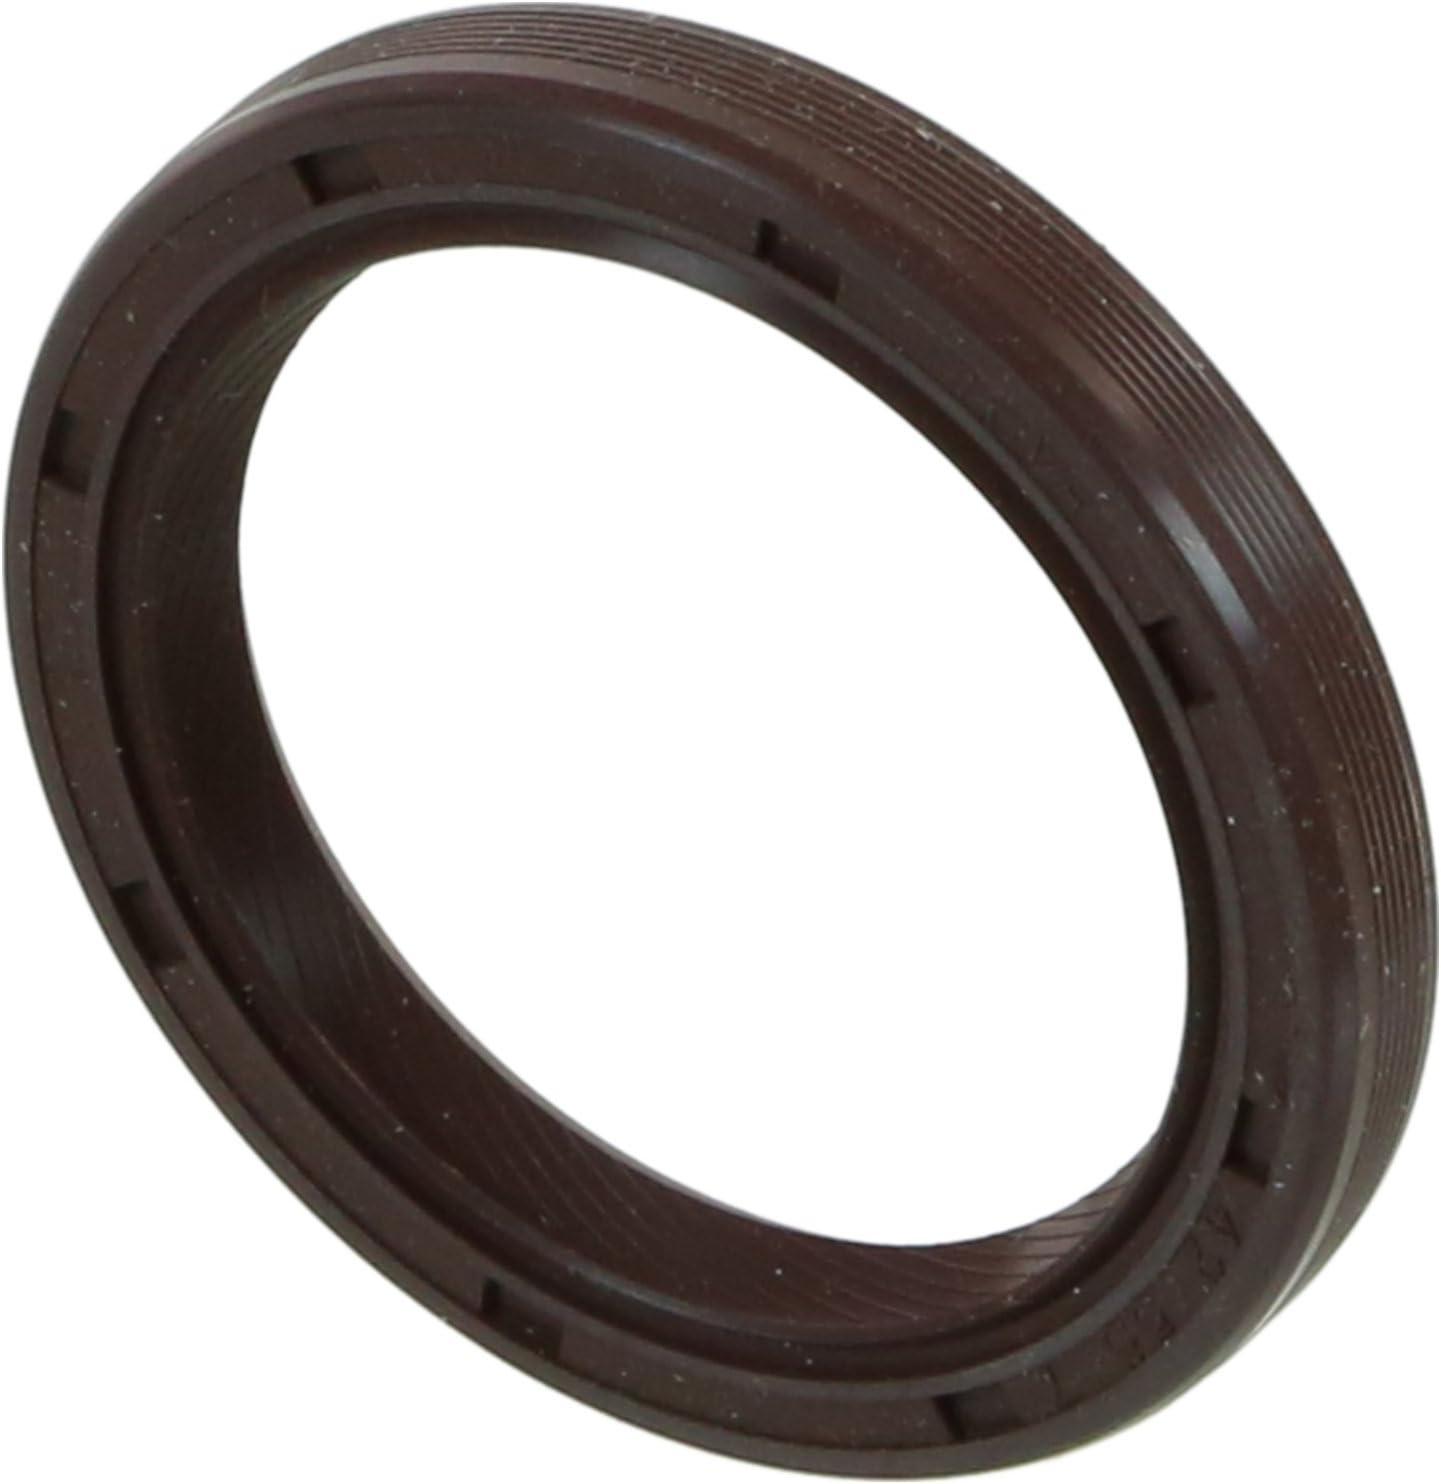 National 710620 Crankshaft Seal